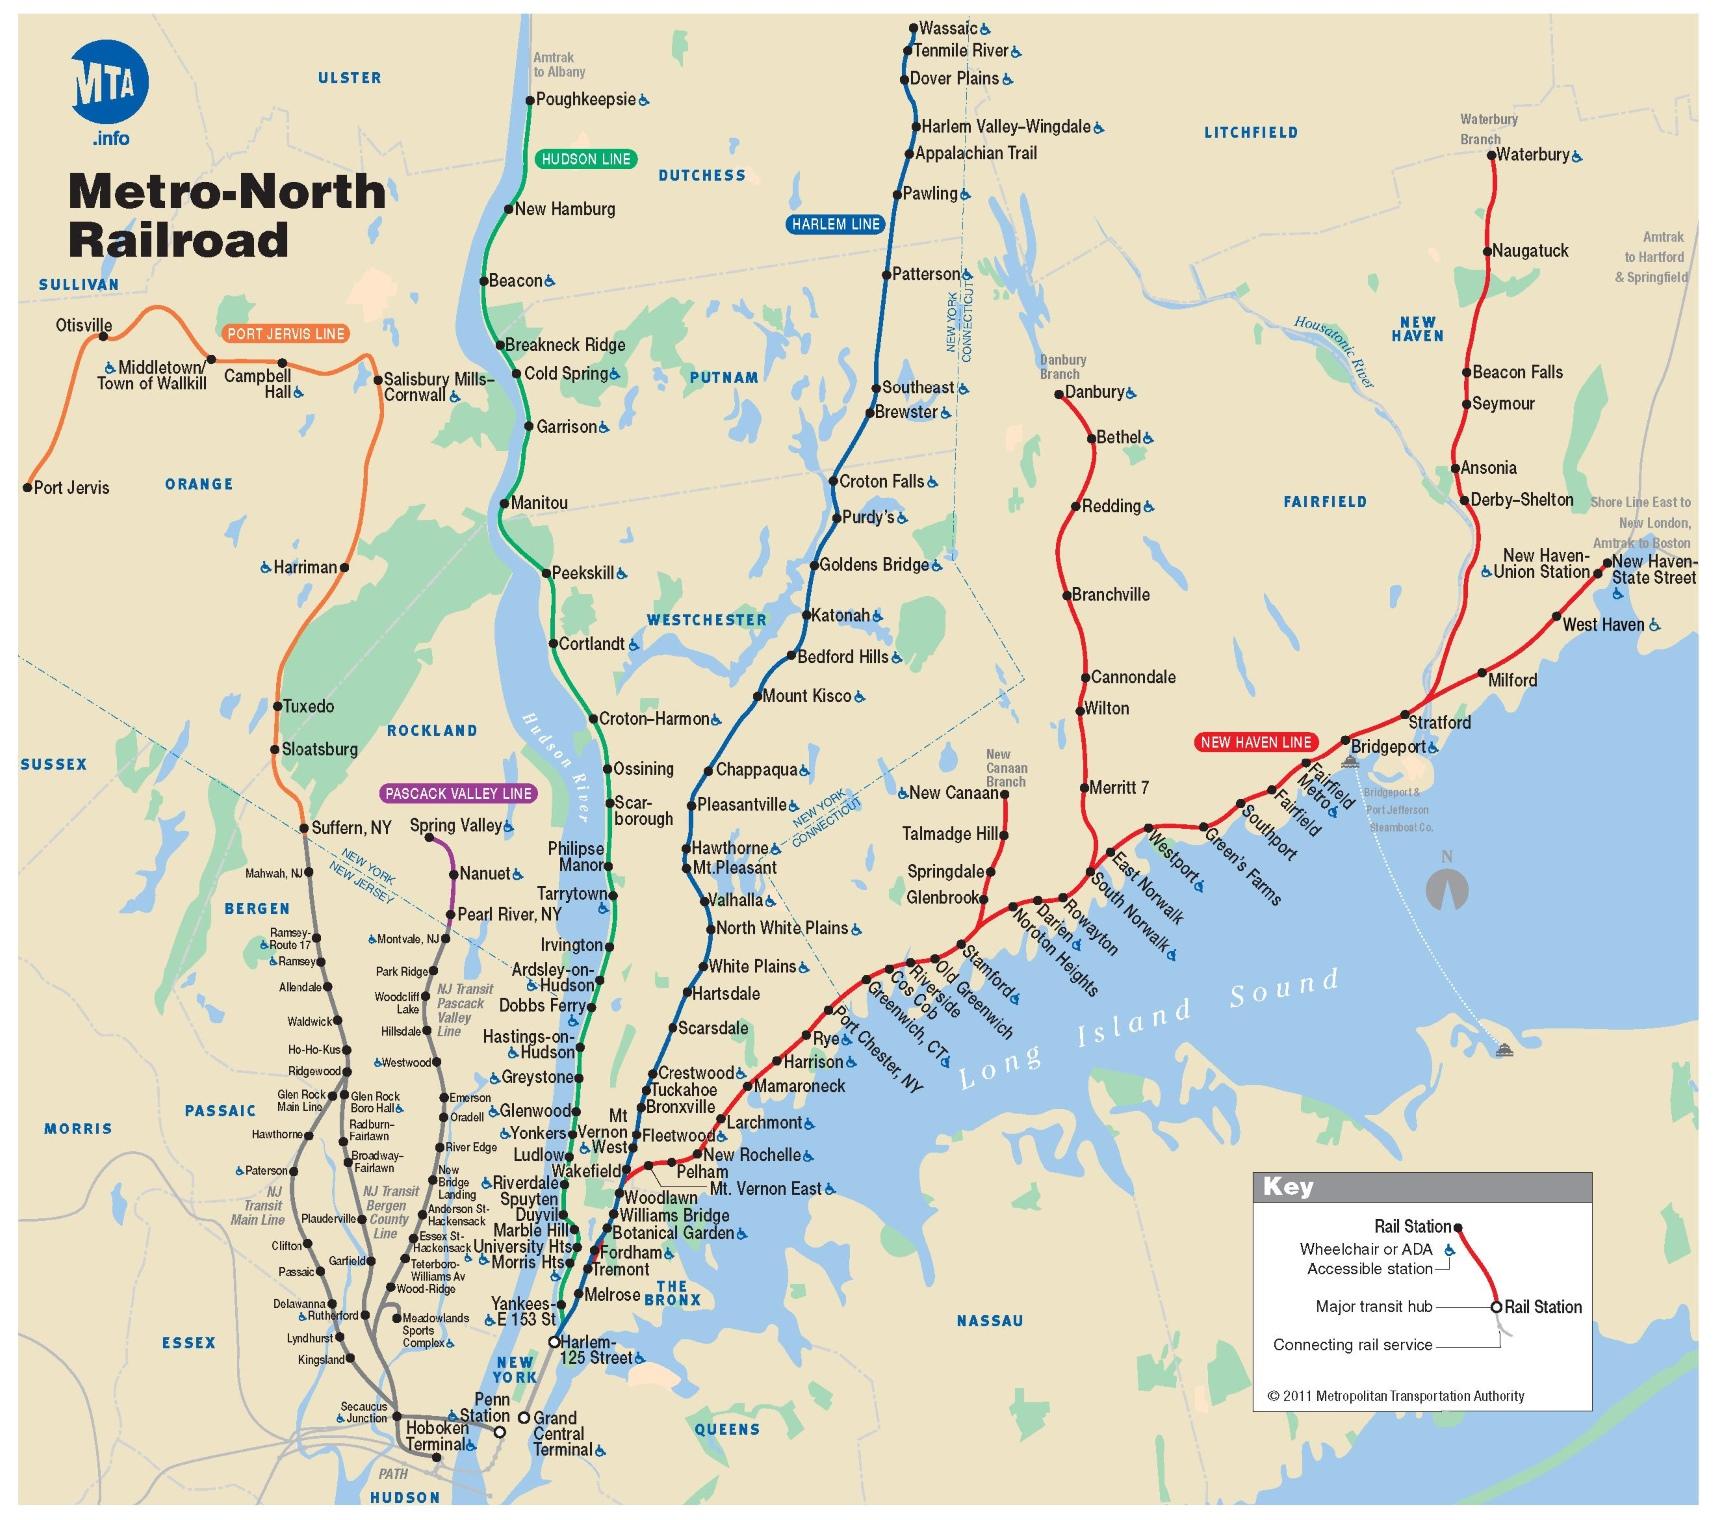 new york metro north railroad mnr map